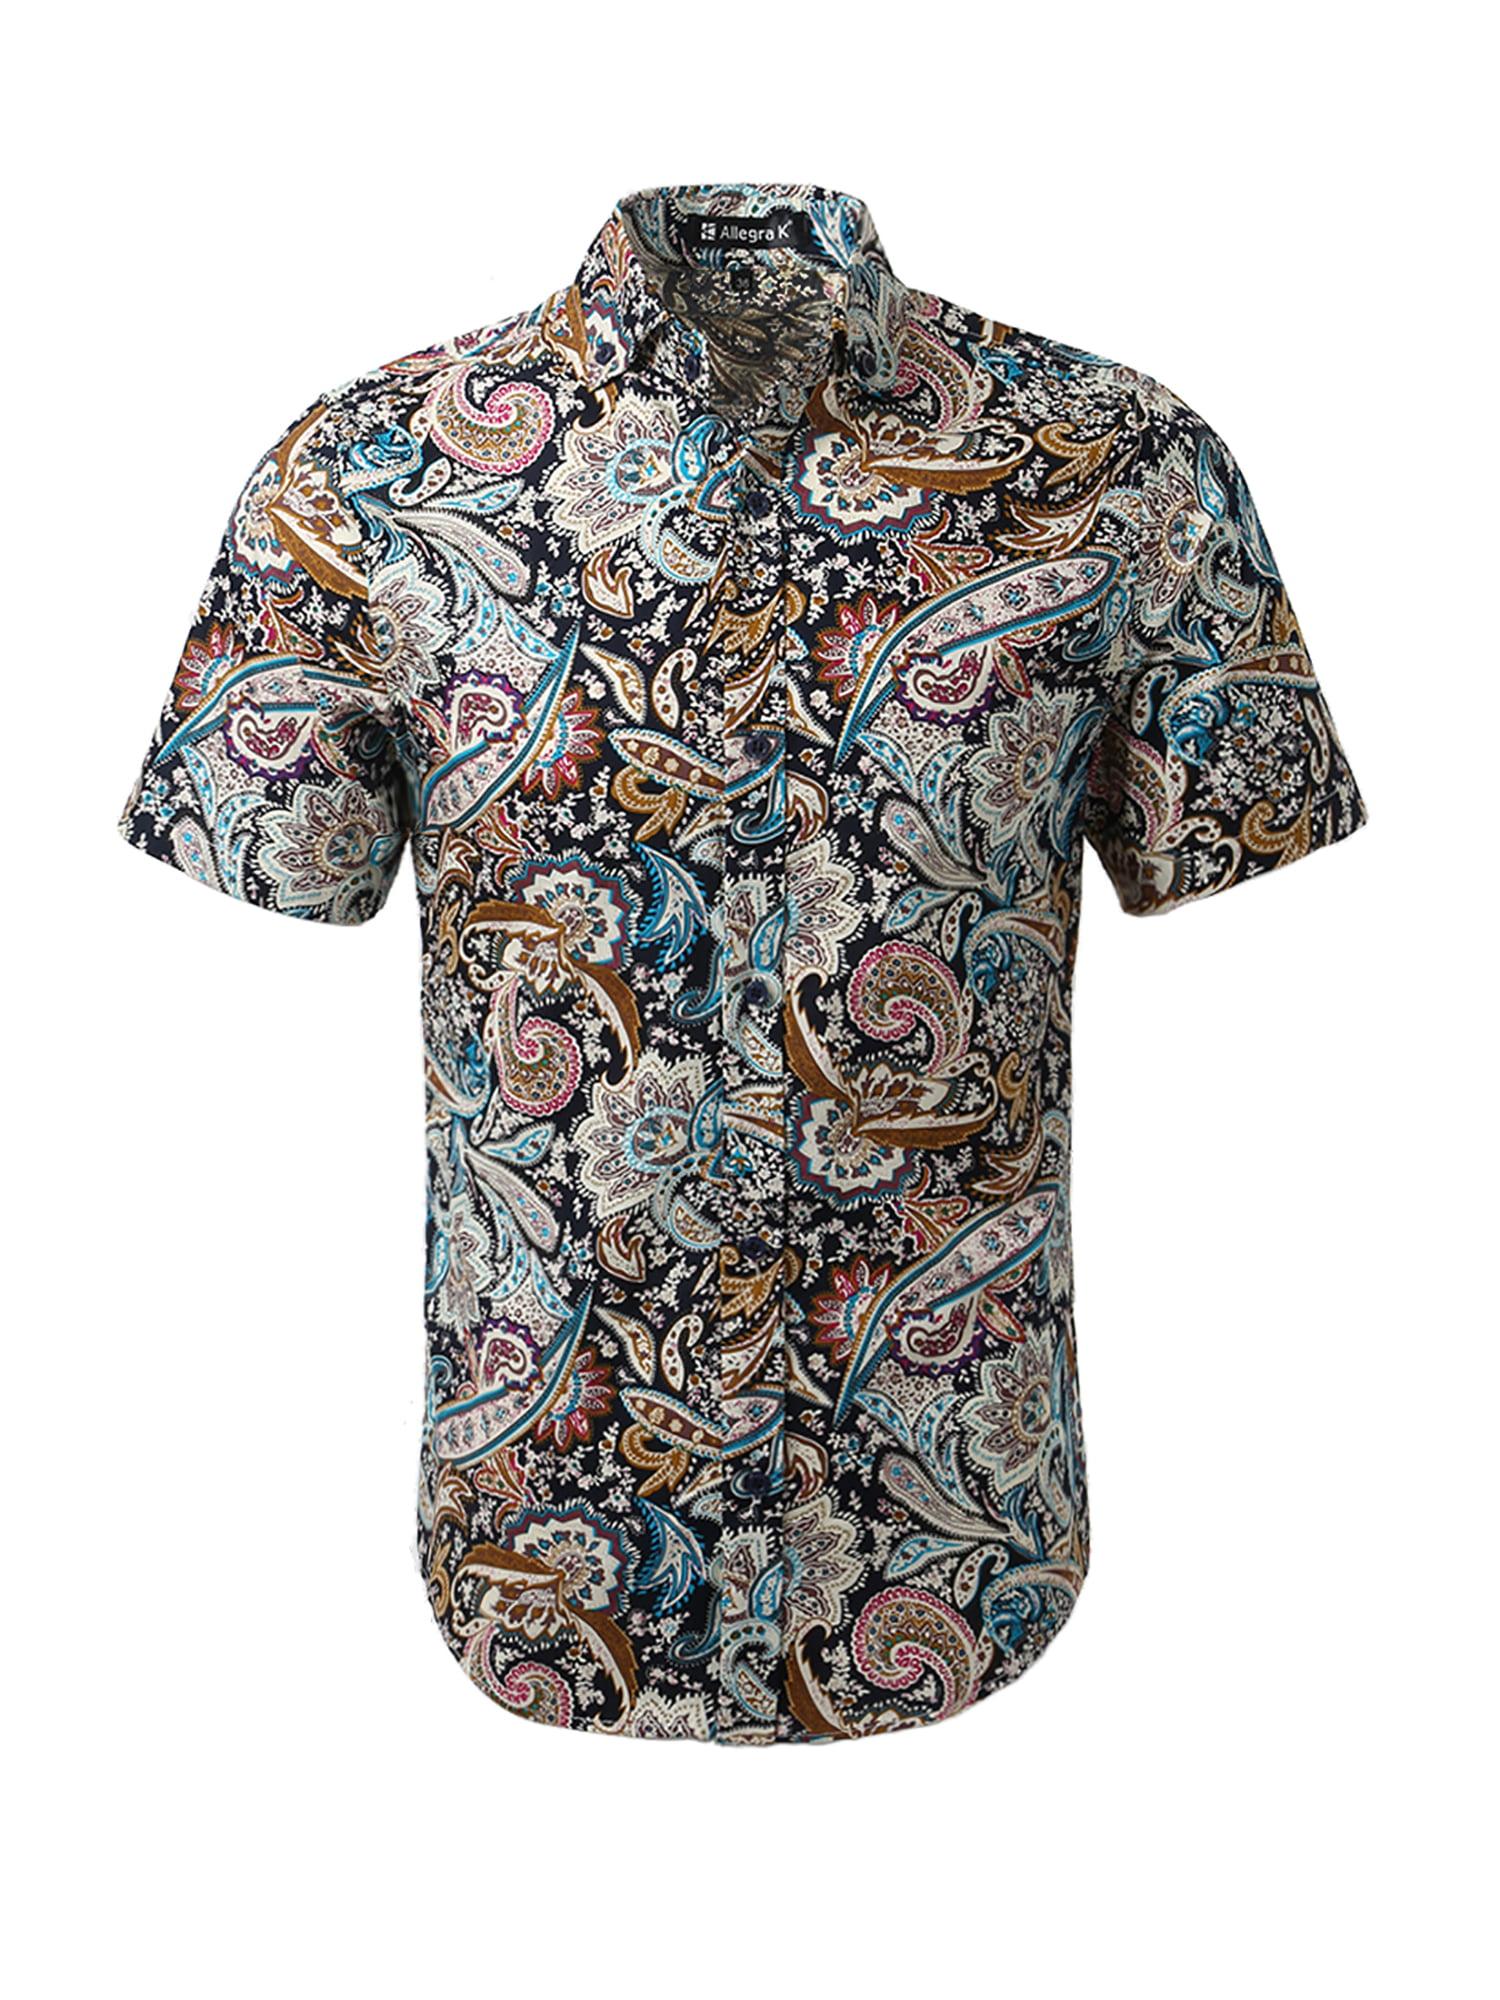 Unique Bargains Men's Summer Pineapple Short Sleeve Button Down Hawaiian Shirt